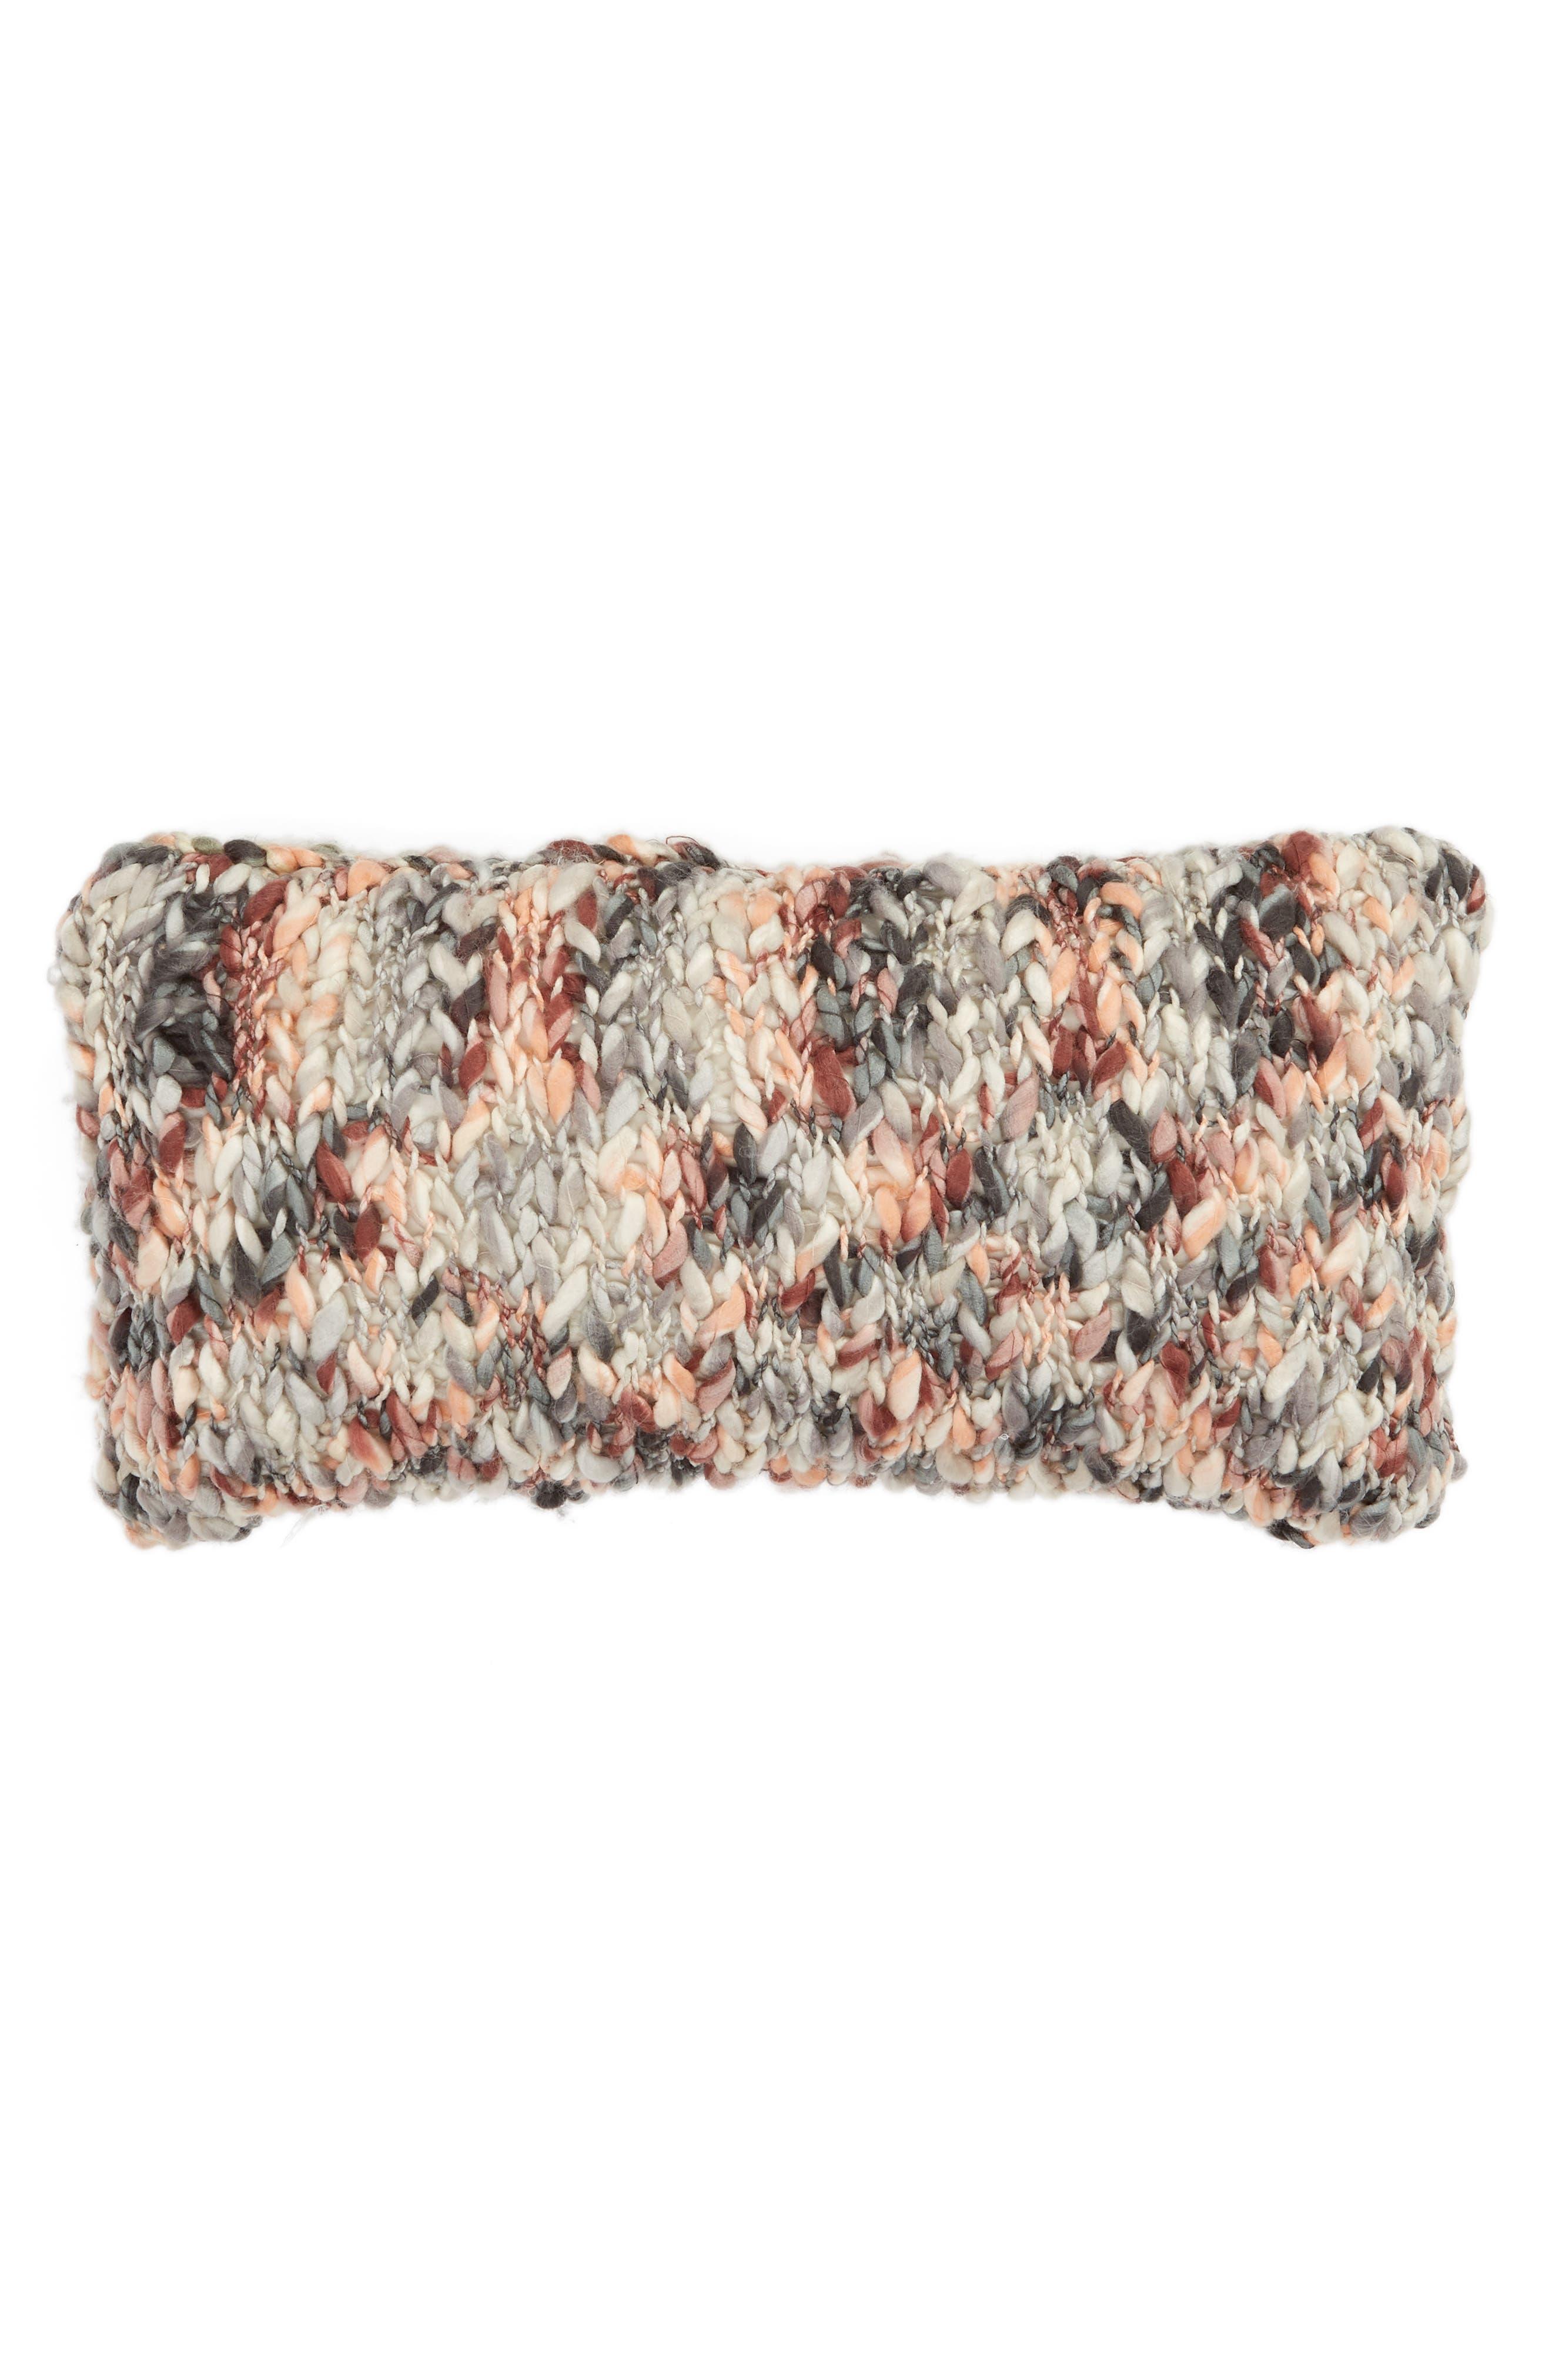 TREASURE & BOND, Slub Knit Accent Pillow, Main thumbnail 1, color, BROWN ROSE MULTI